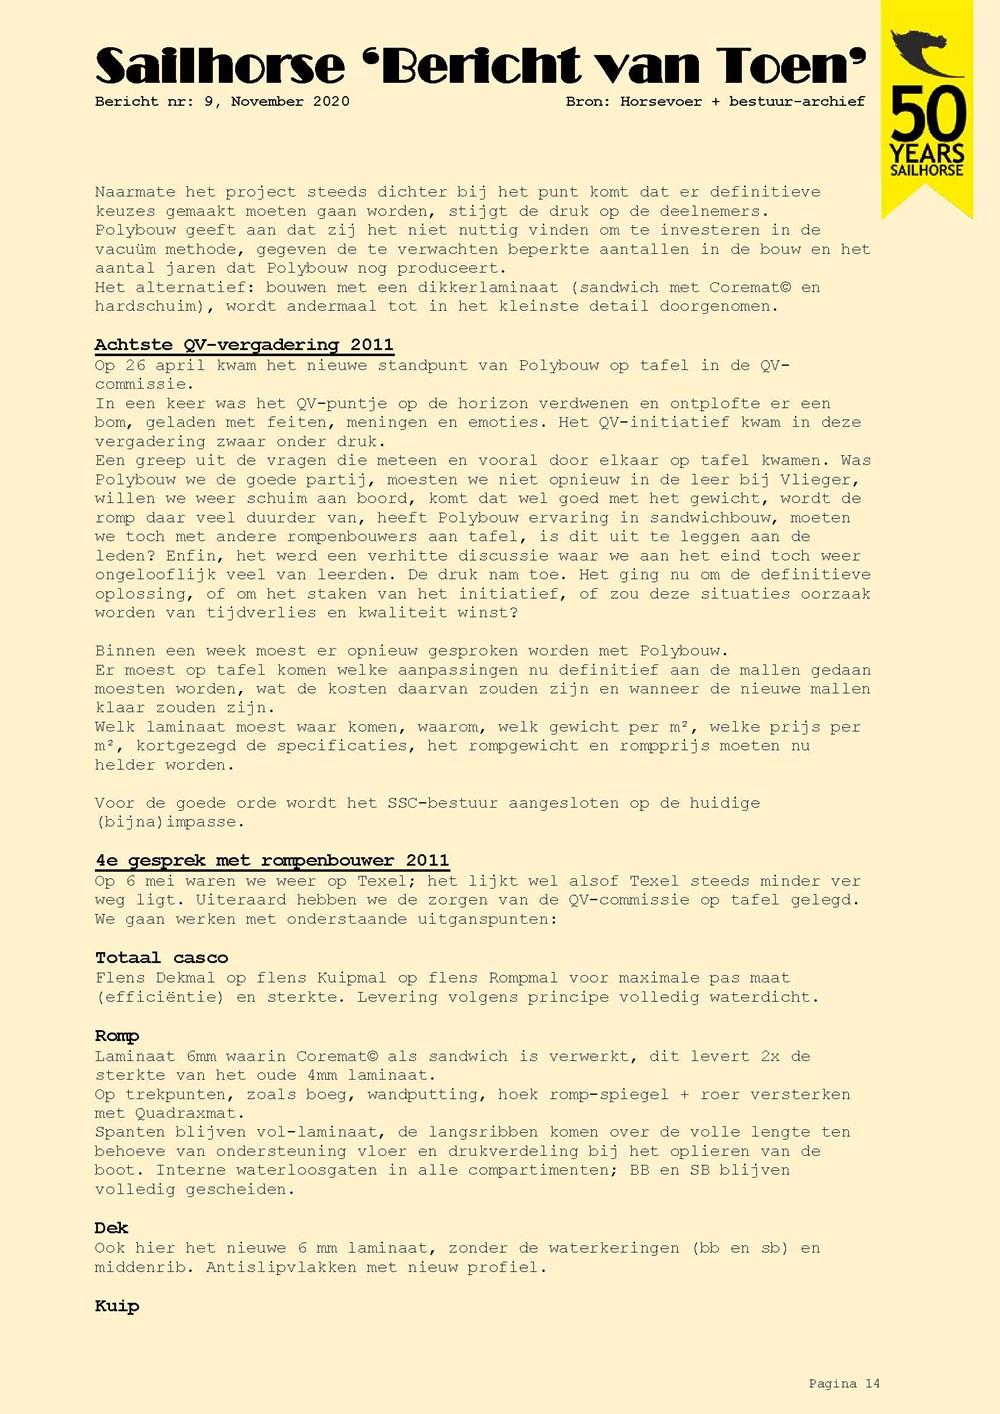 BvT09_Page_14.jpg